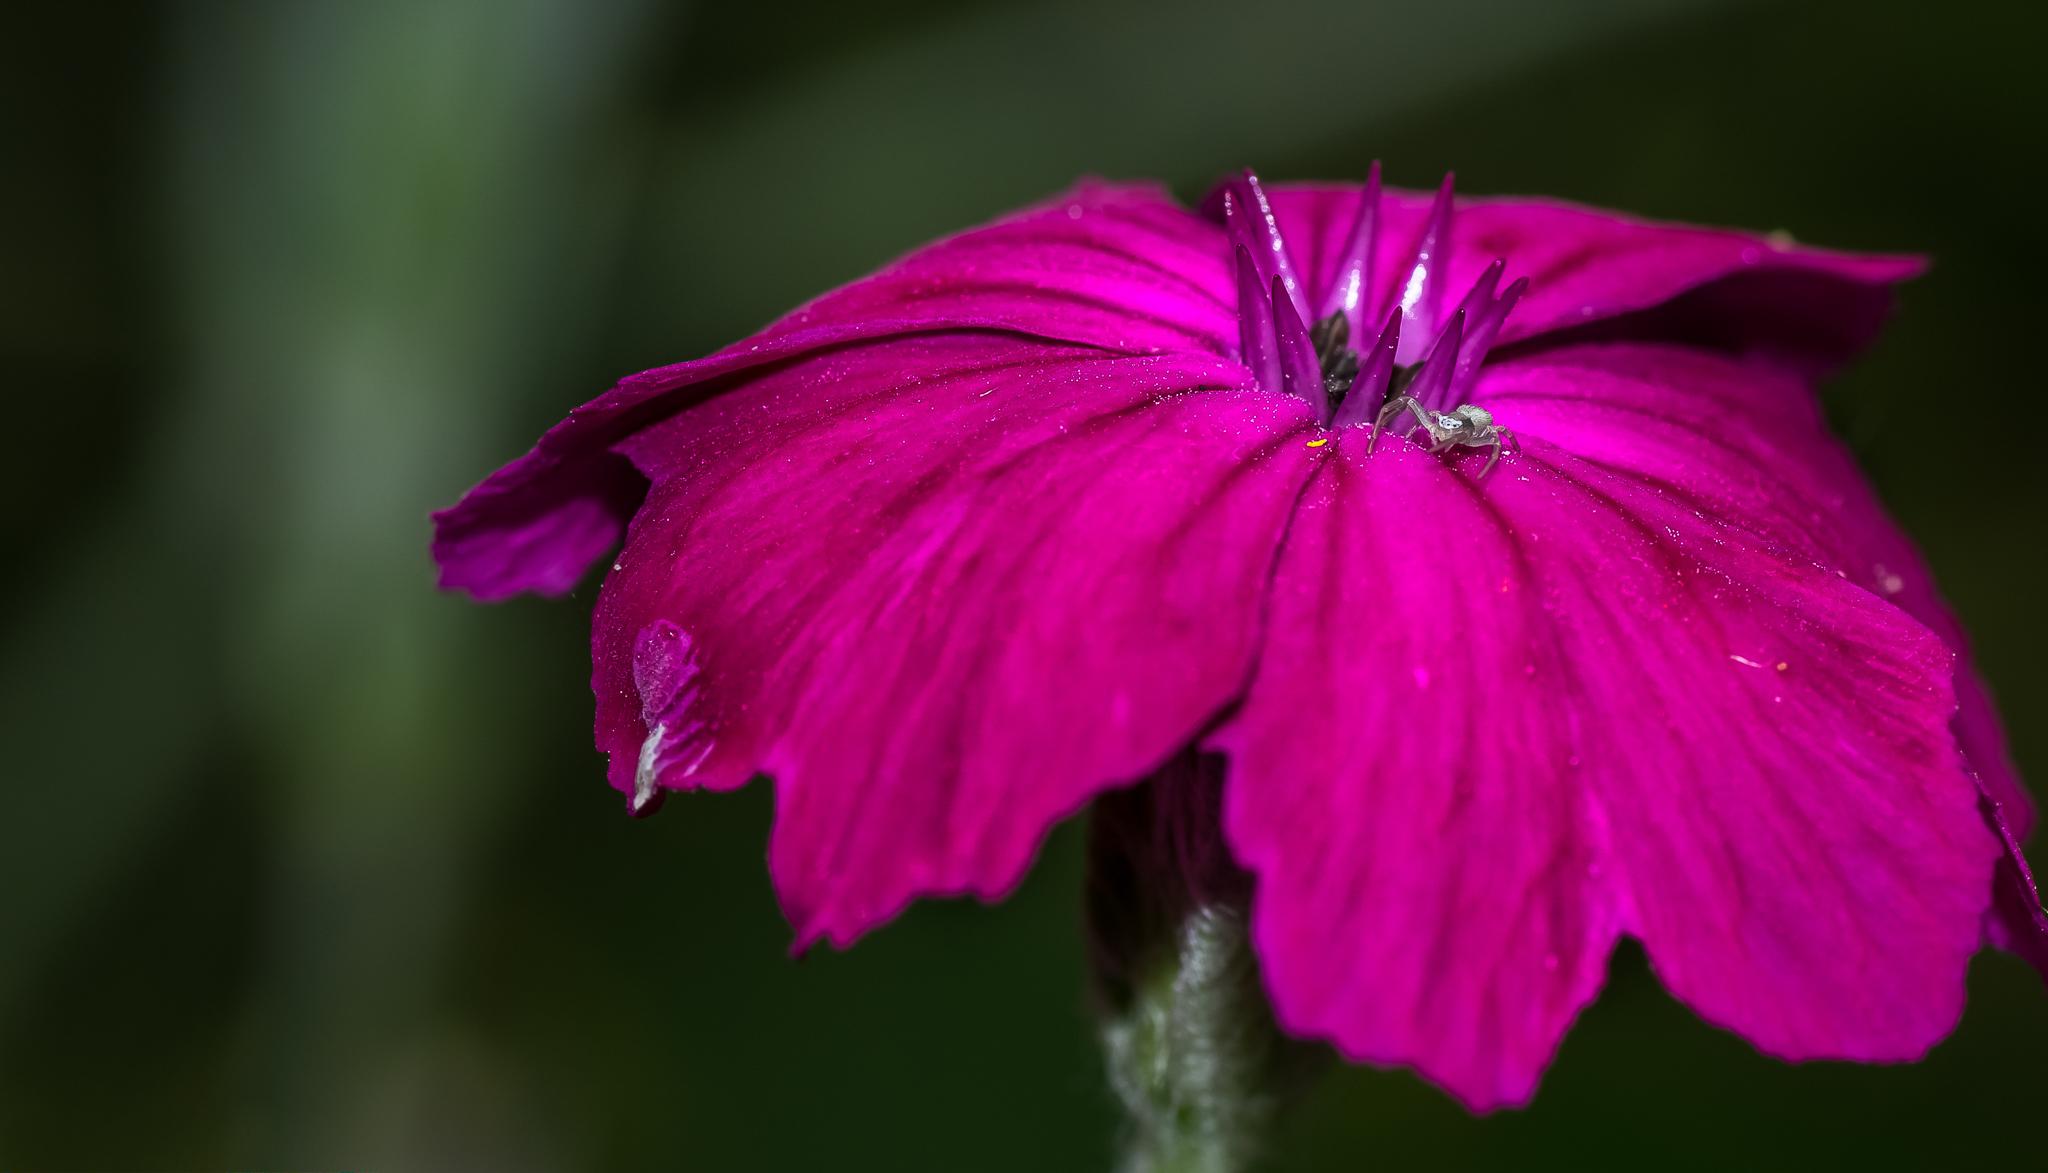 Fotos gratis : naturaleza, fotografía, hoja, pétalo, rosado, flora ...